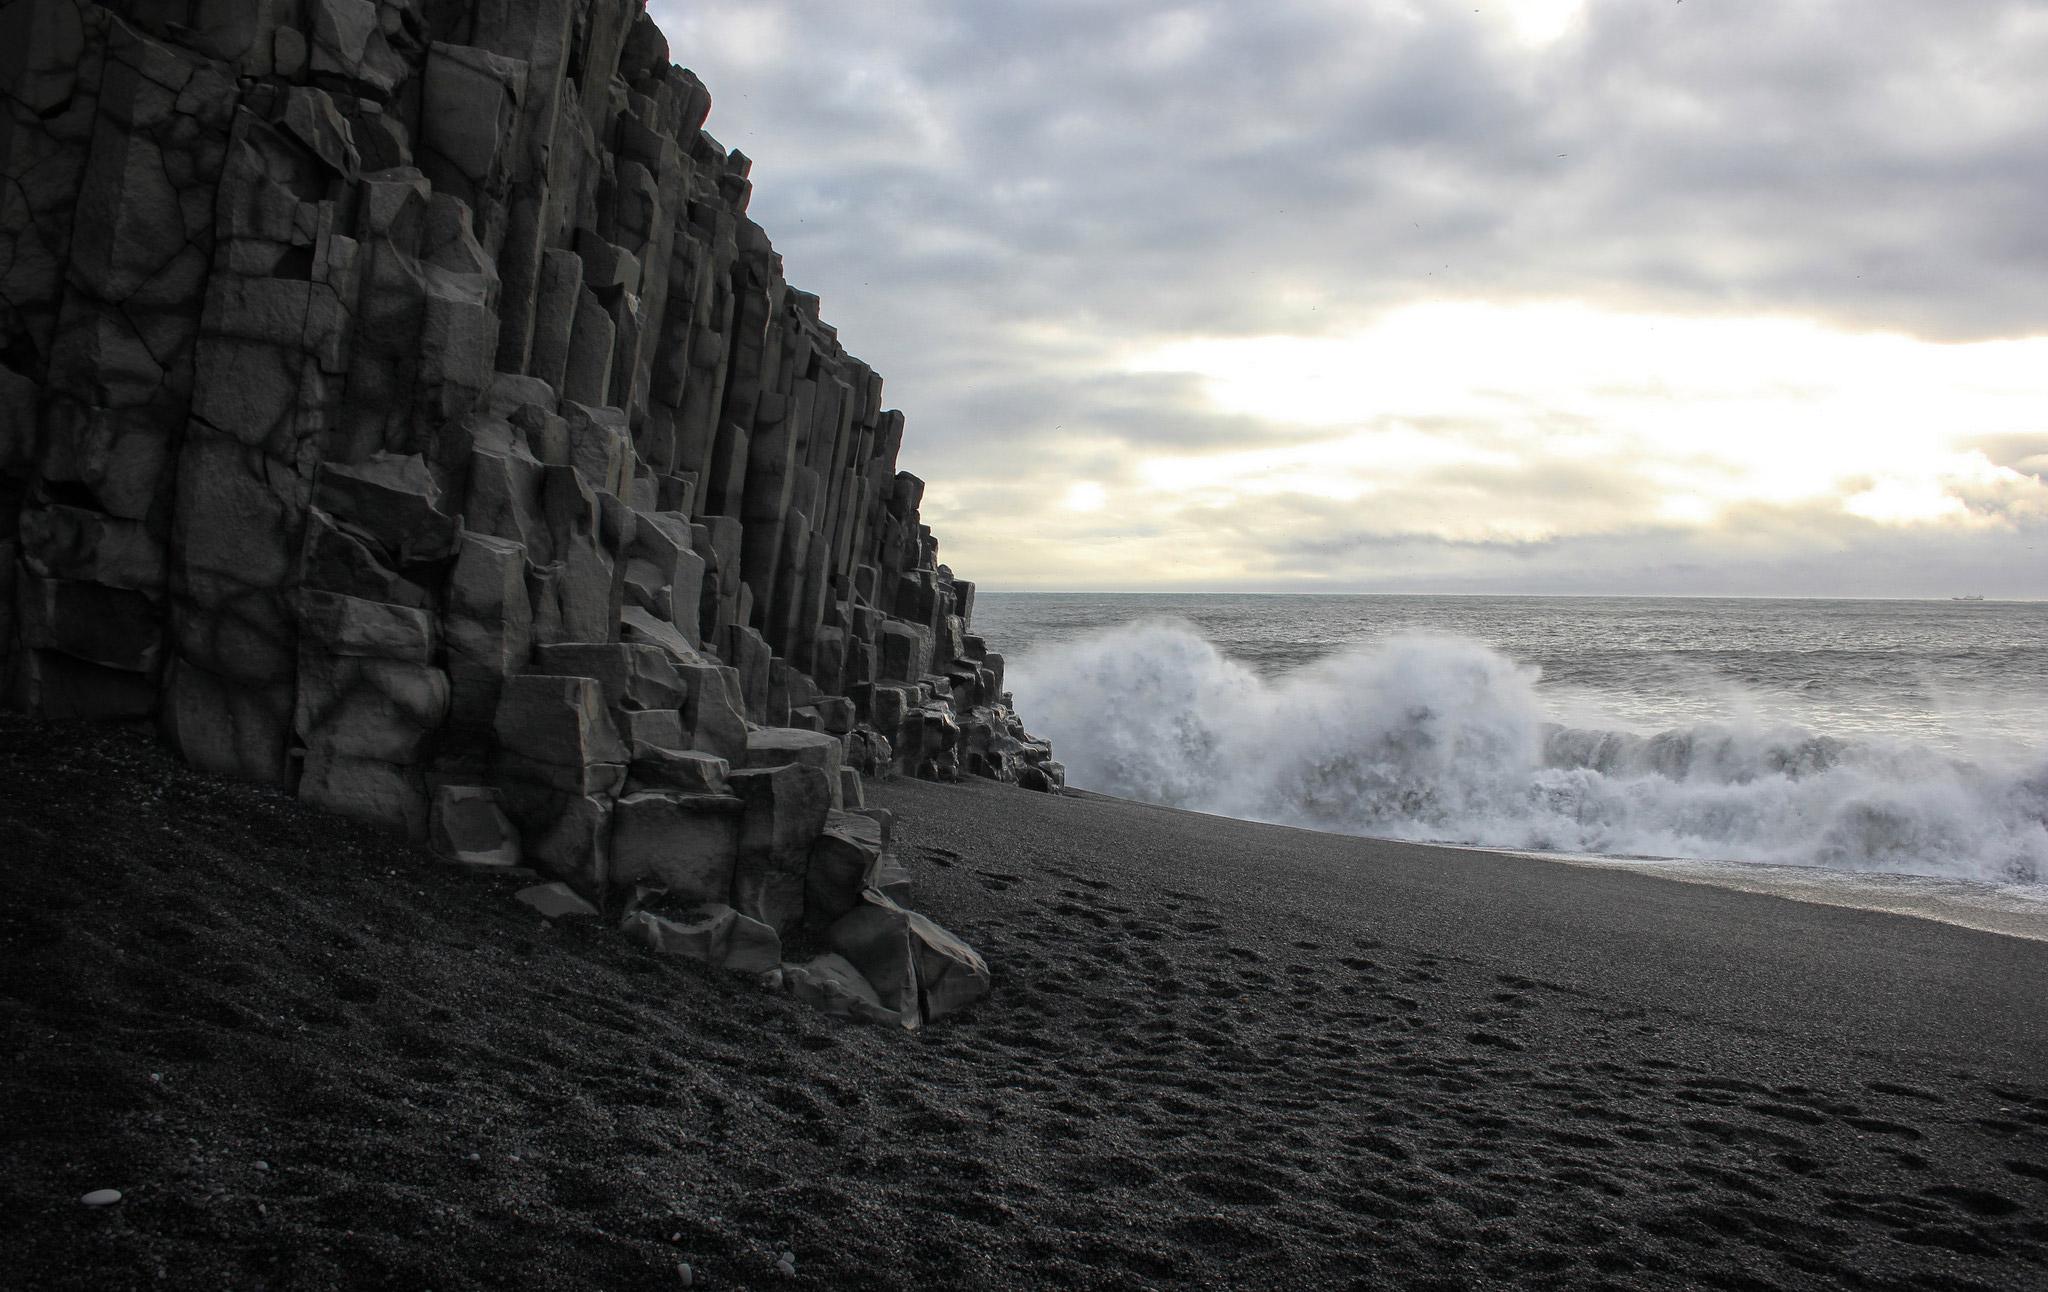 The waves crashing against the basalt cliffs at Vik